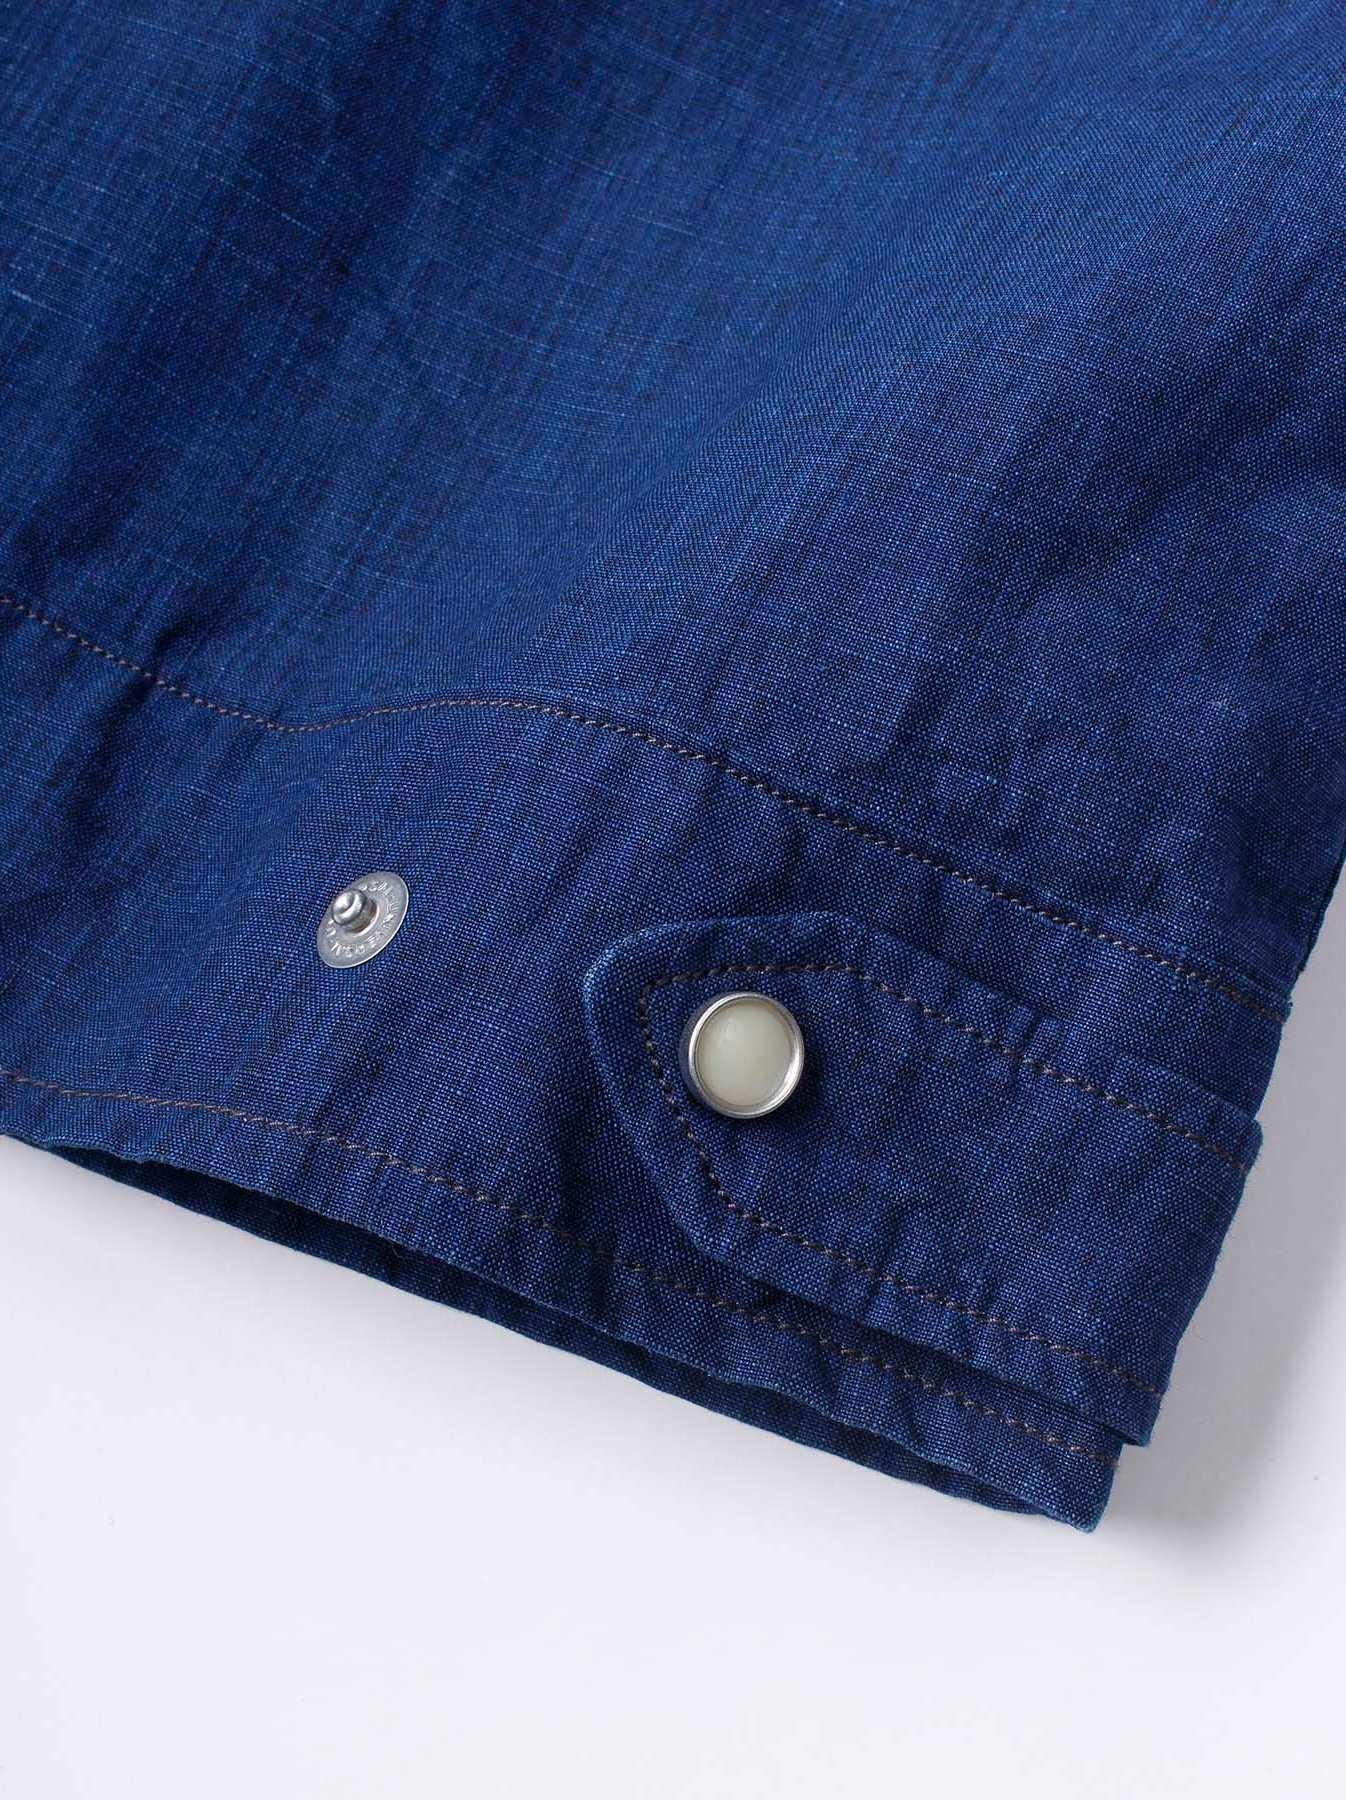 WH Indigo Linen Jean Jacket Bolero-10